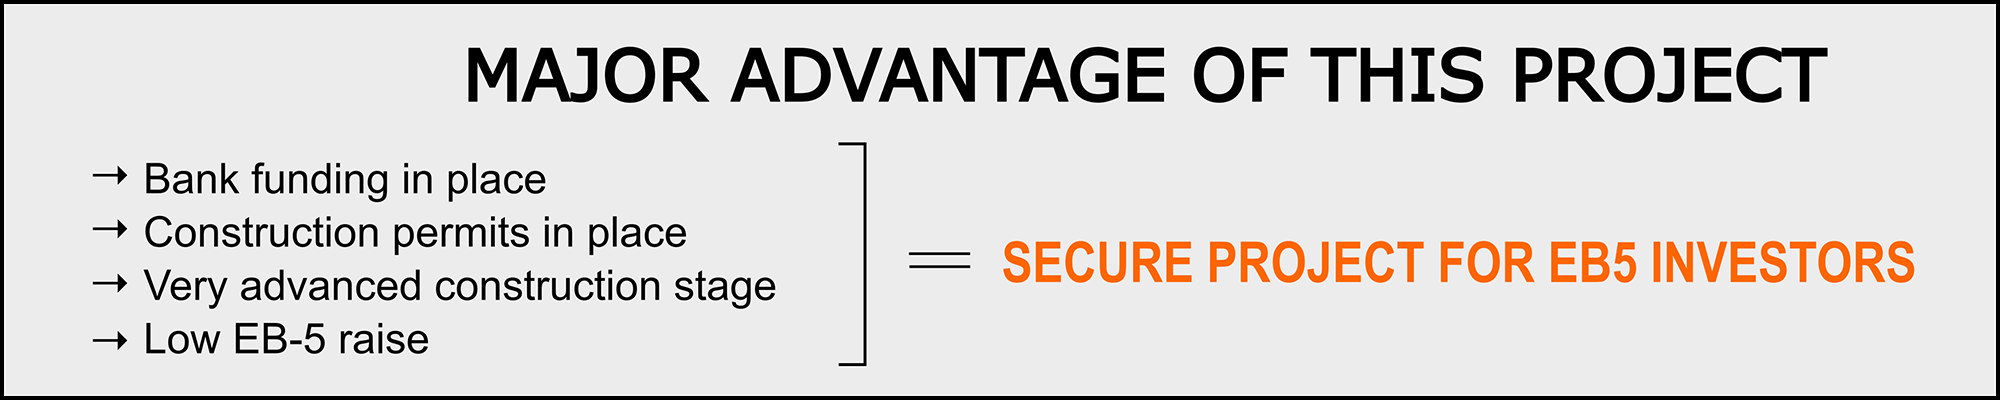 Major Advantage